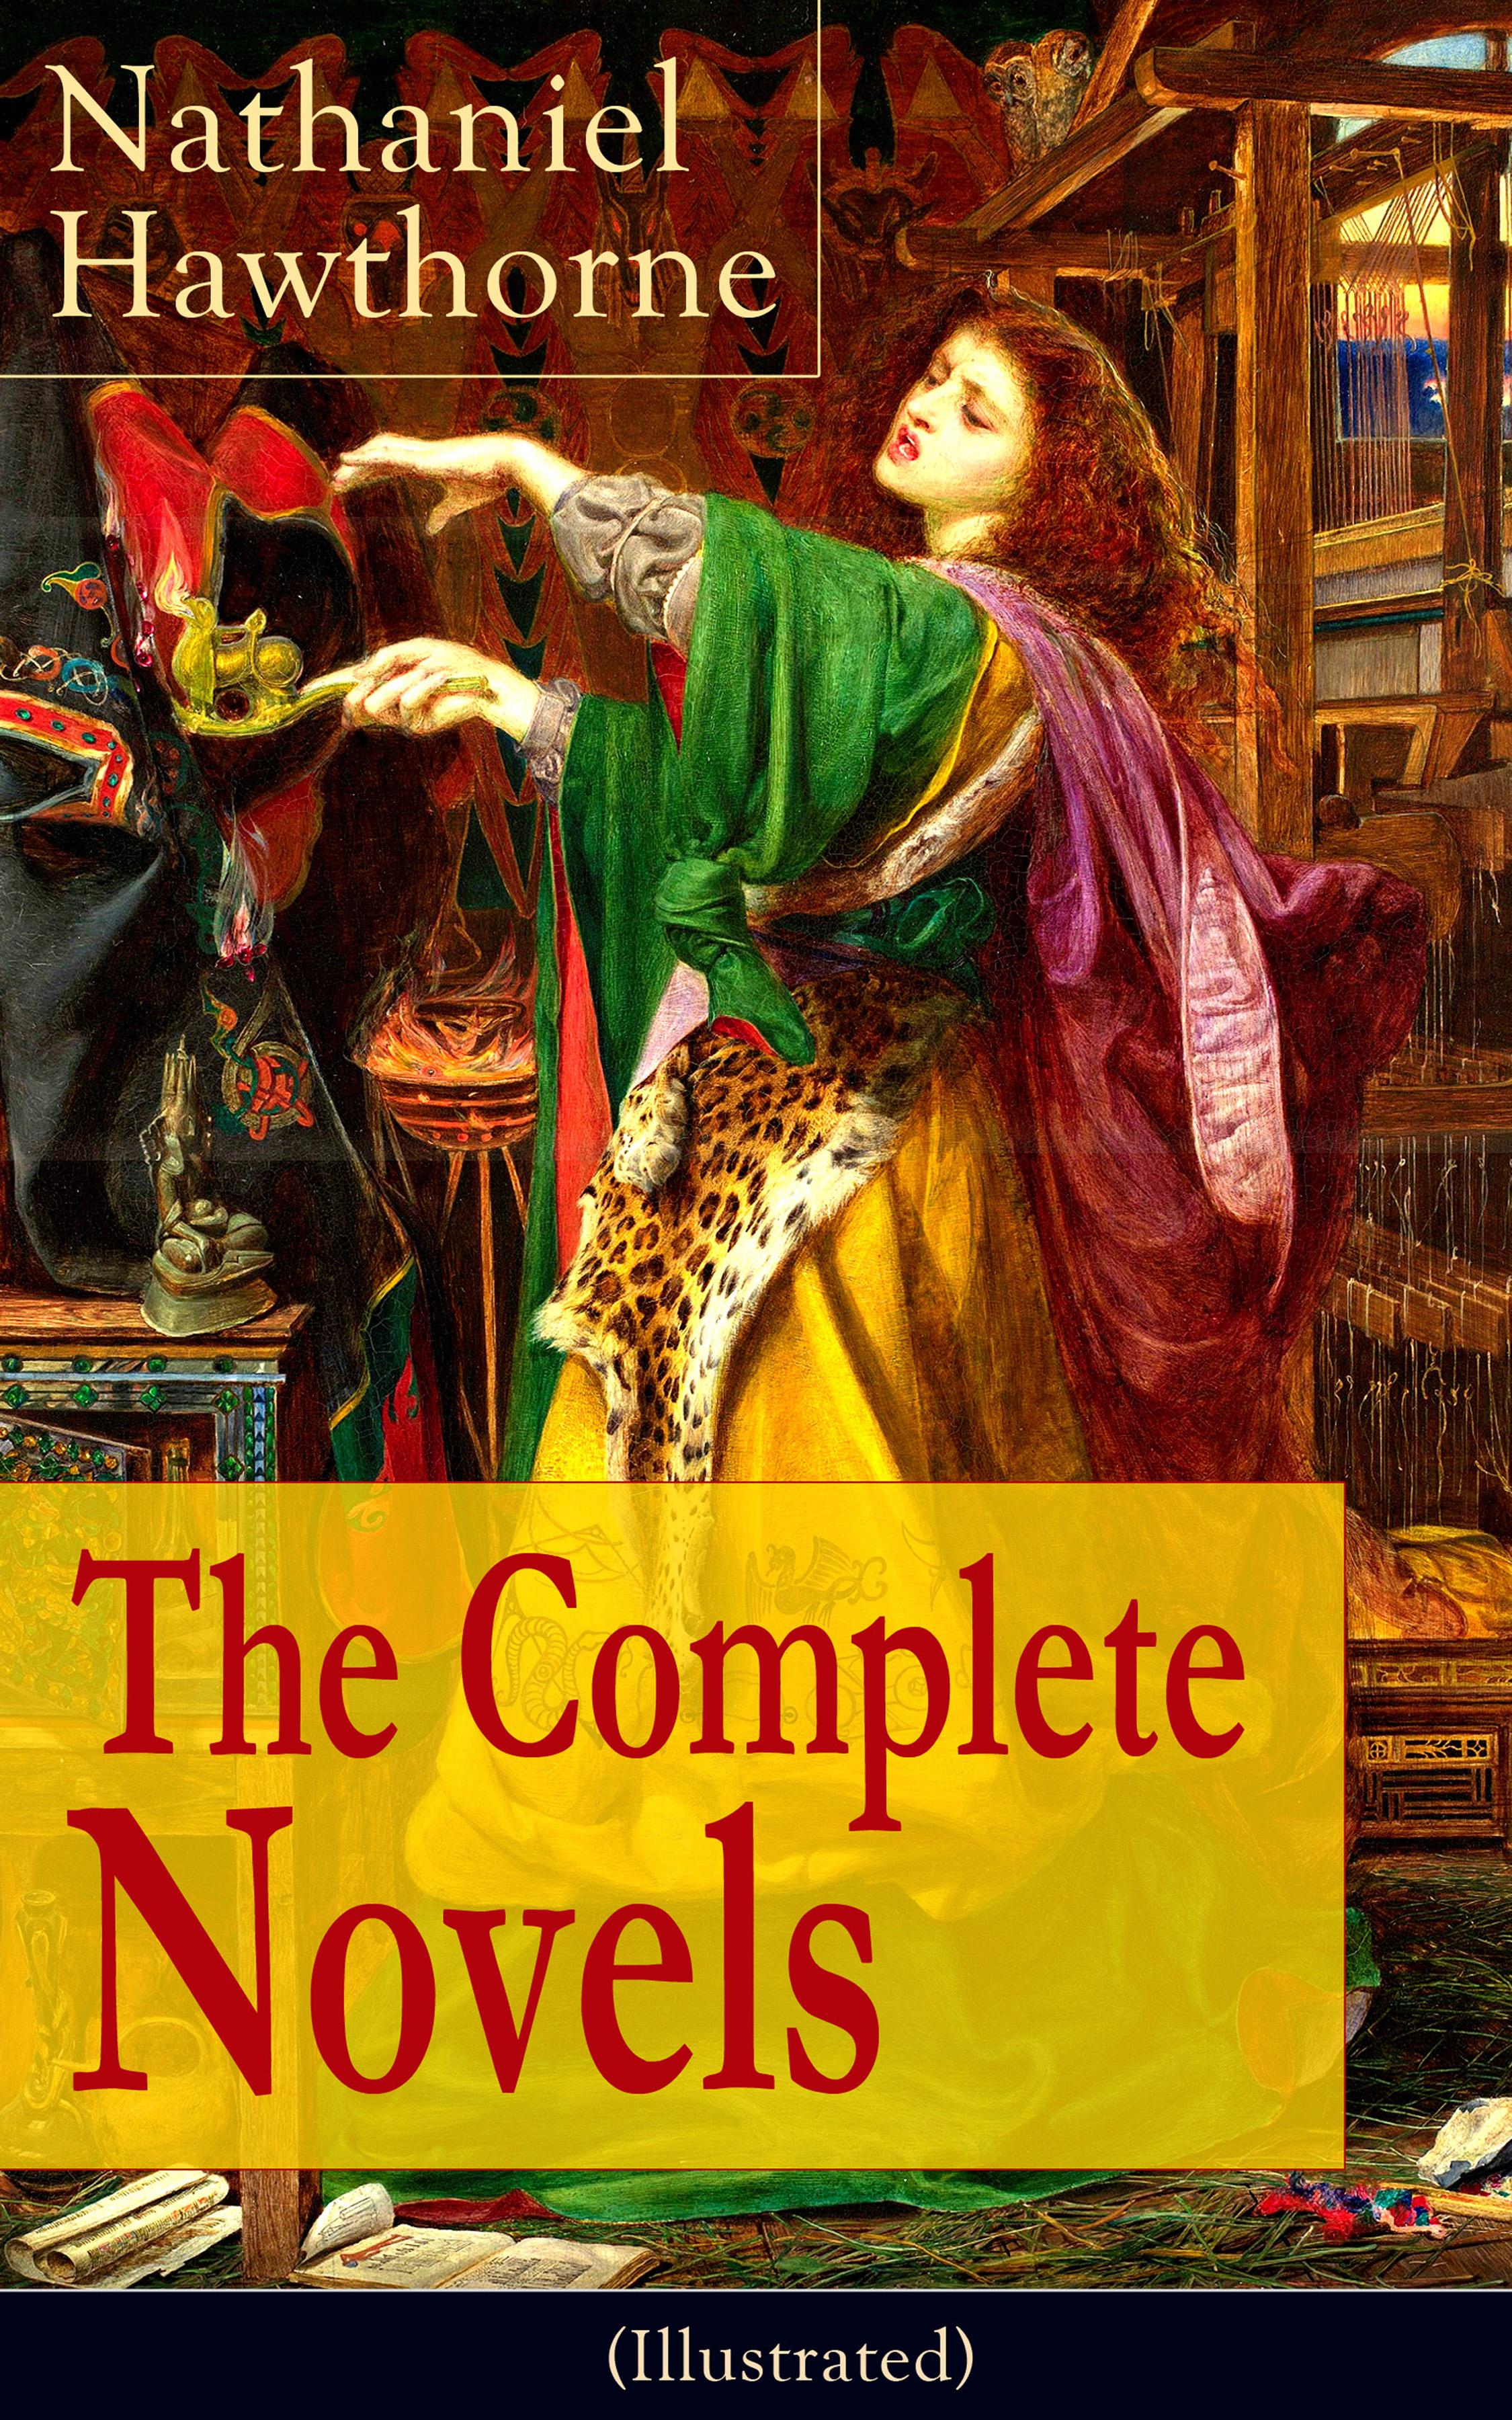 цена Nathaniel Hawthorne The Complete Novels of Nathaniel Hawthorne (Illustrated) онлайн в 2017 году